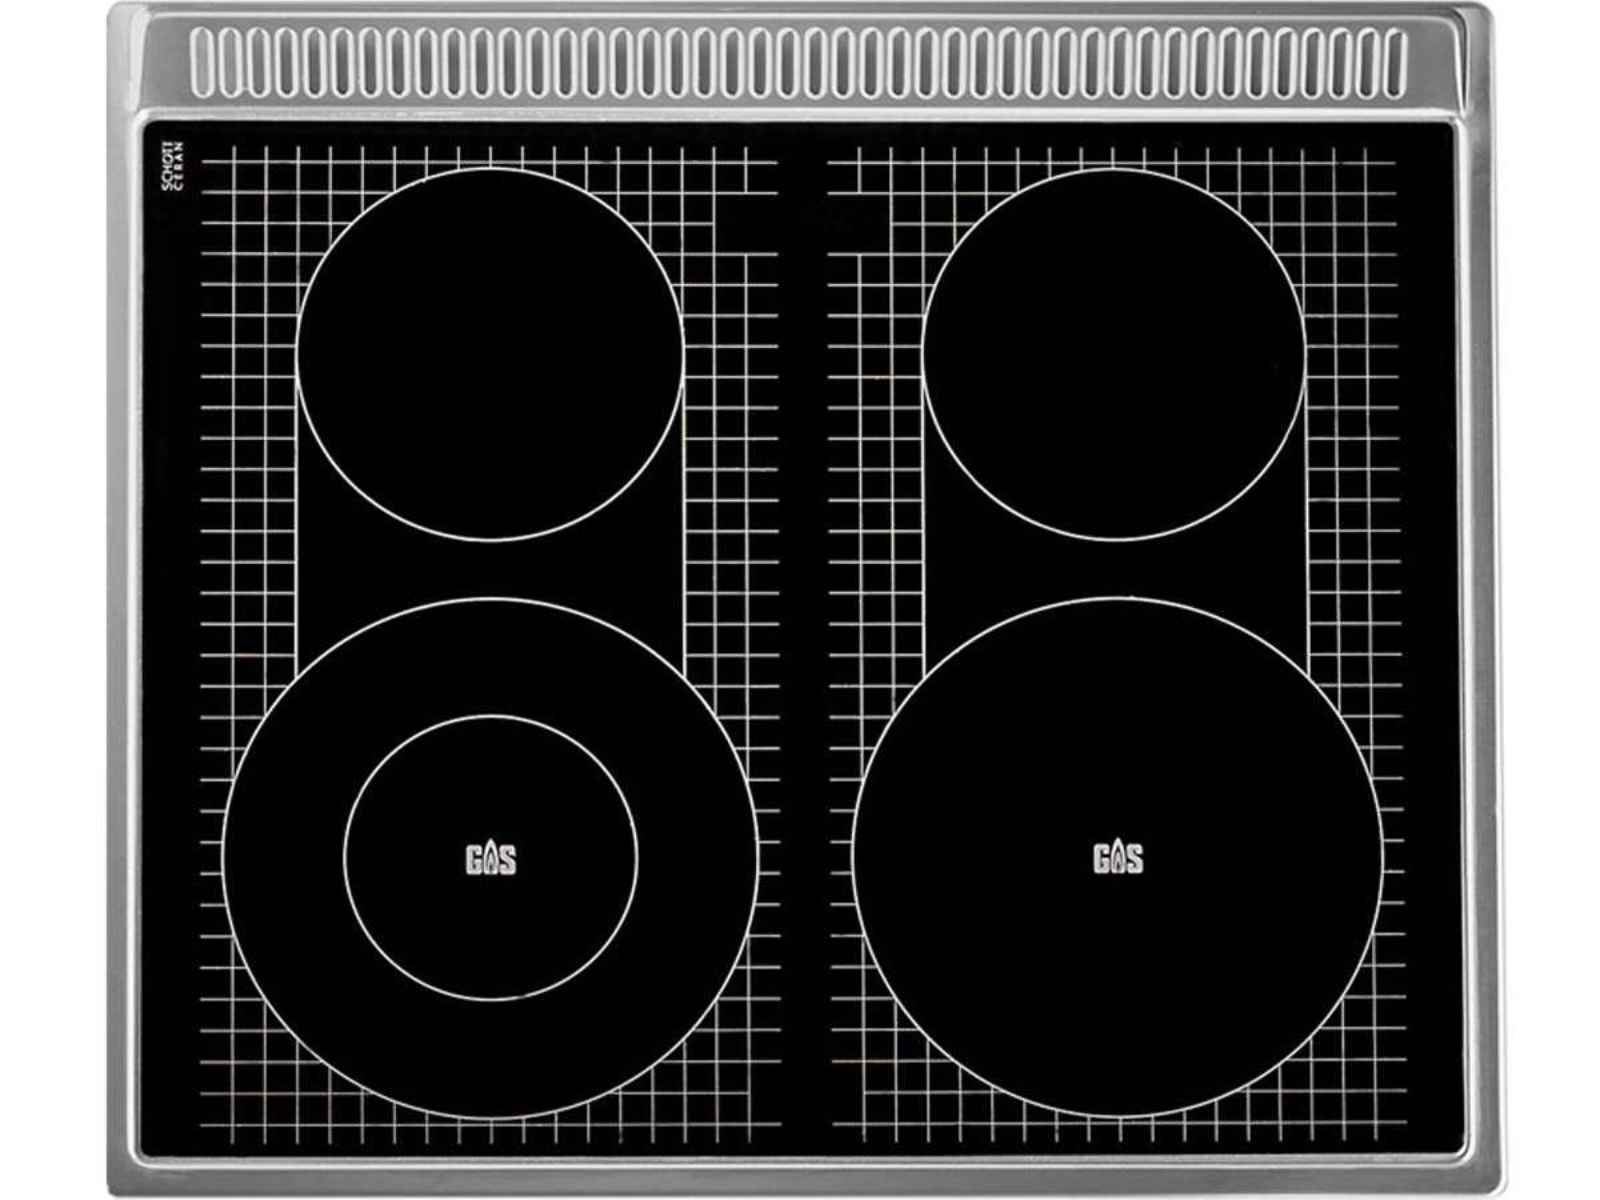 oranier set herd ehg 3010 gas unter glas kochfeld ekg 6 05. Black Bedroom Furniture Sets. Home Design Ideas